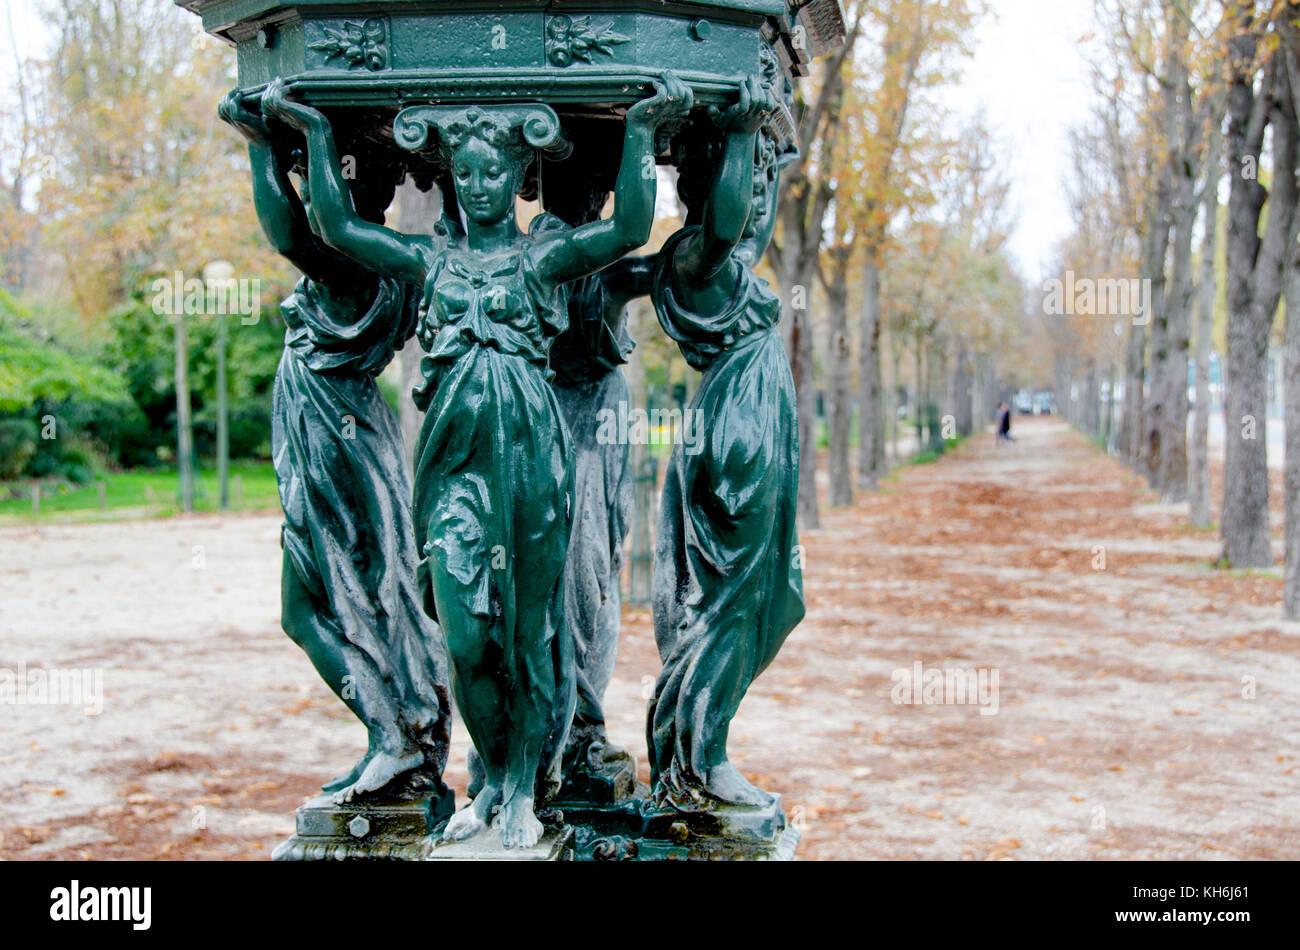 Paris, France. Wallace Fountain on the Avenue des Champs-Élysées - designed by Charles-Auguste Lebourg, - Stock Image